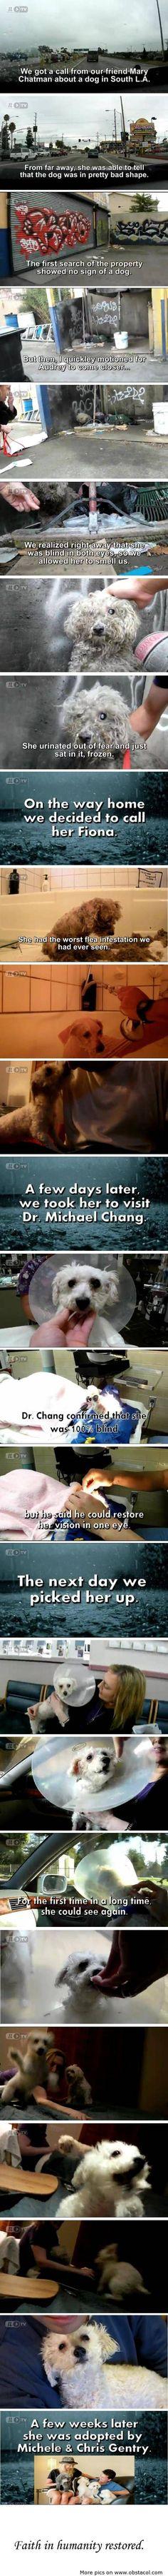 Dog rescue...